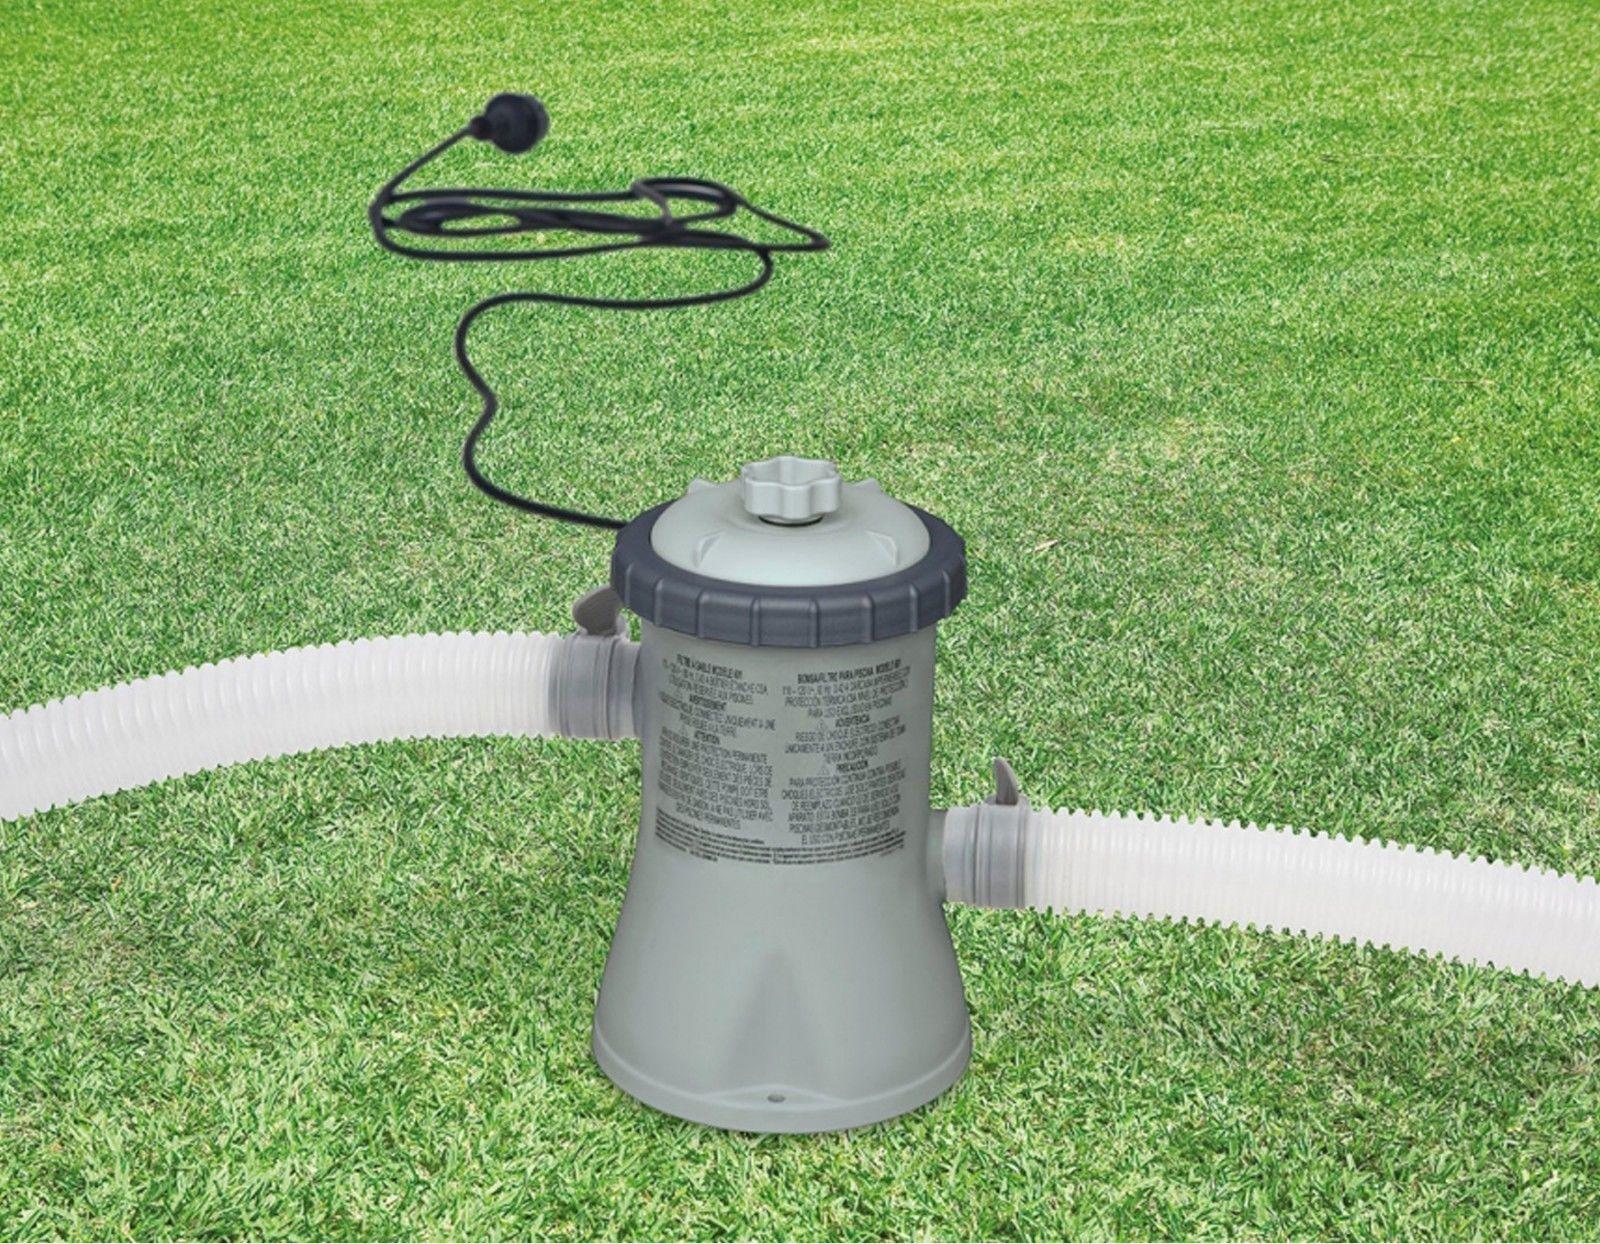 Intex 330 gph easy set 28601eg swimming pool cartridge - Swimming pool cartridge filters pump ...